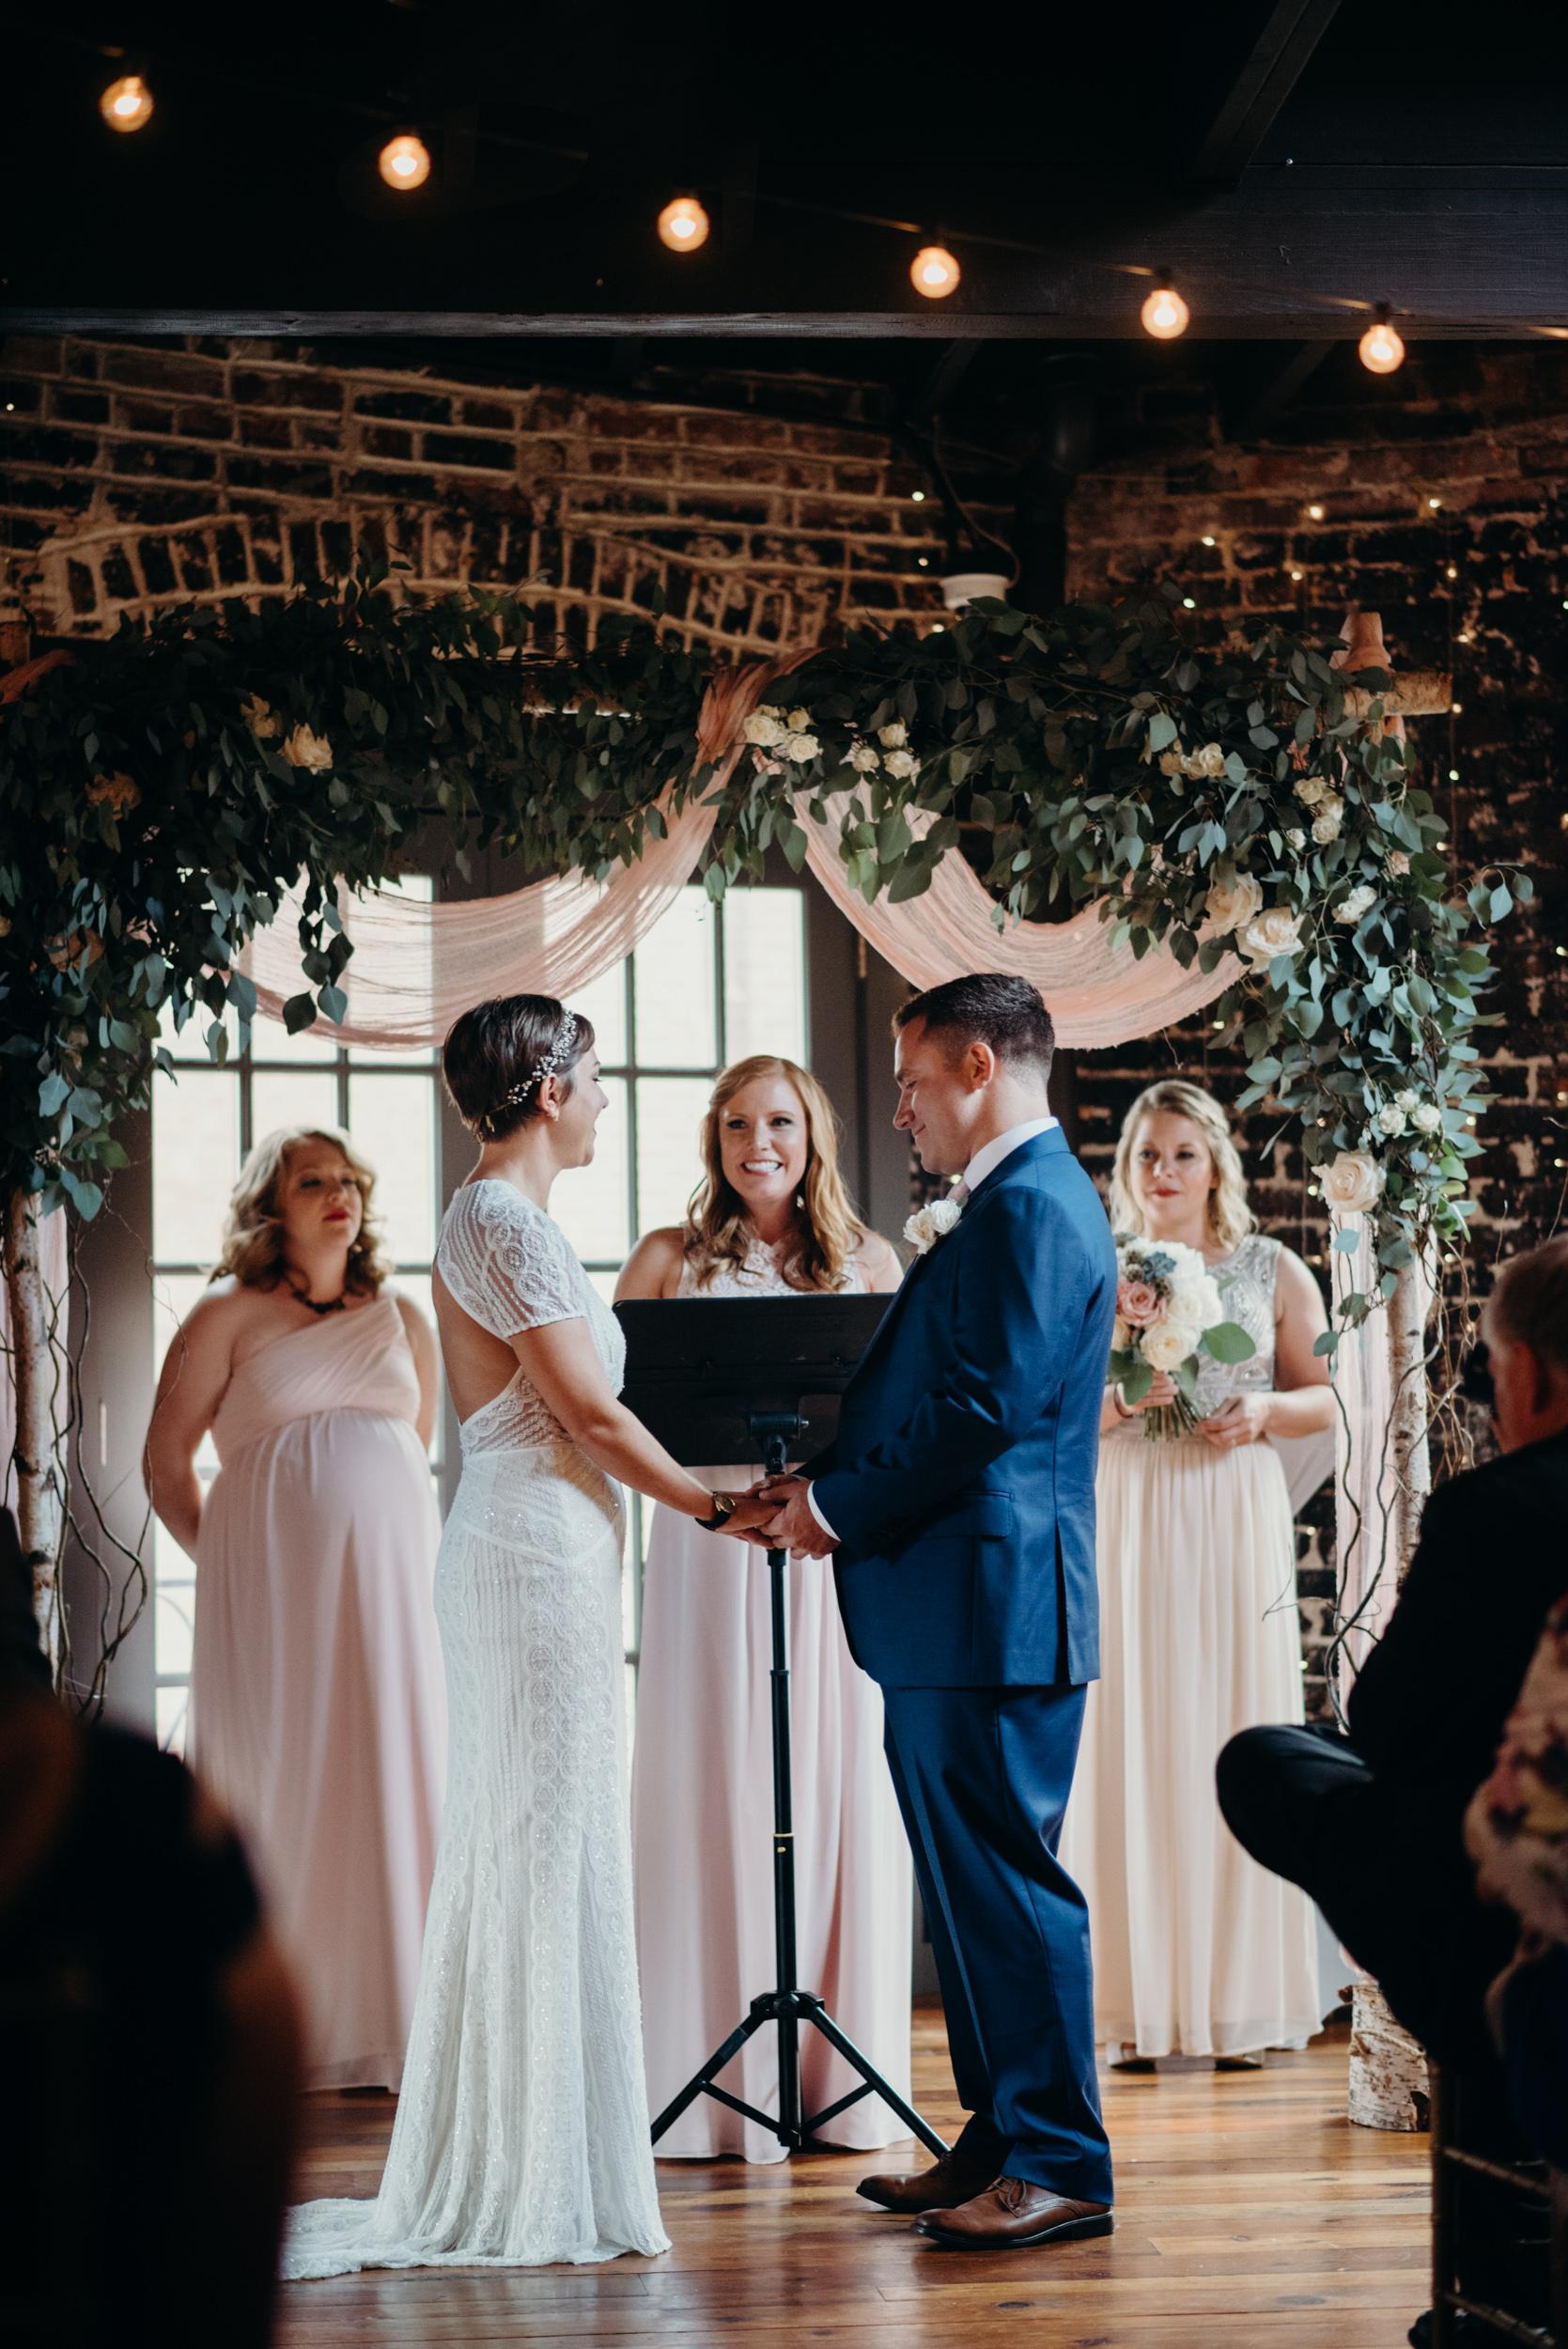 dc-wedding-photographer-toolbox-pilates-megan-graham-photography